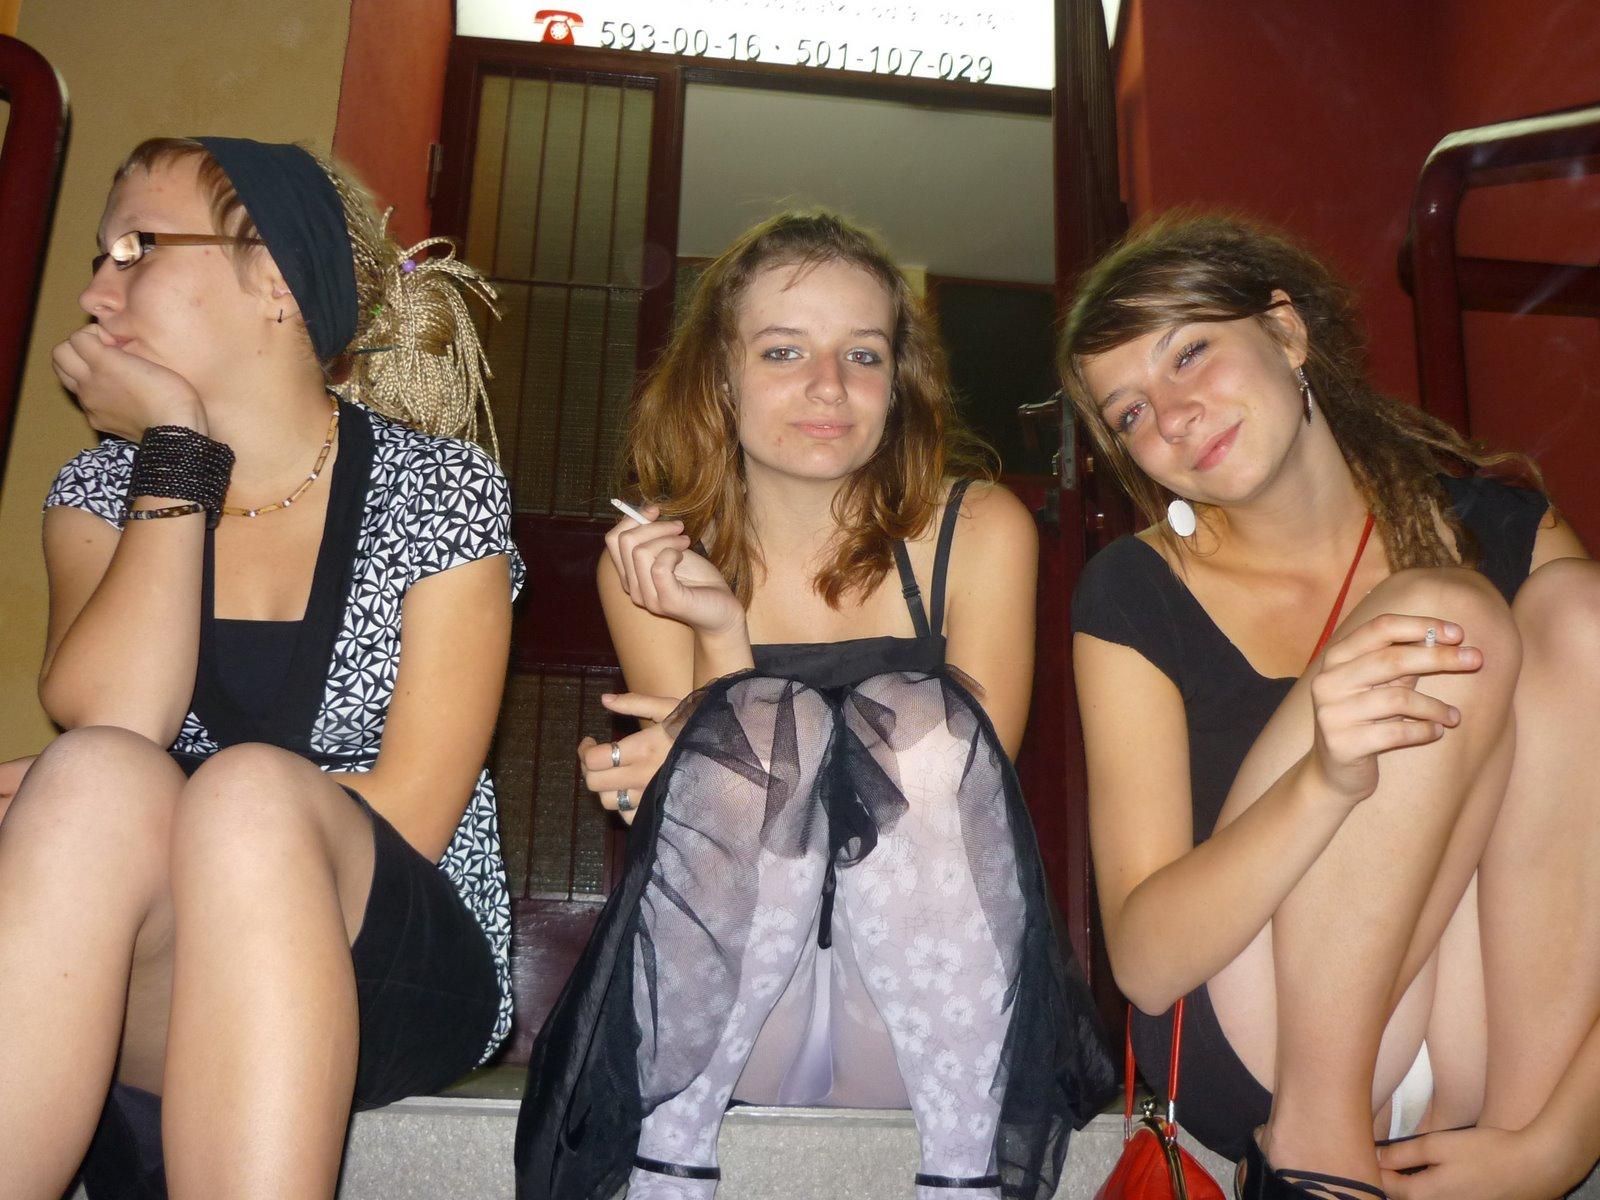 Три девушки в юбках светят трусиками на лестнице